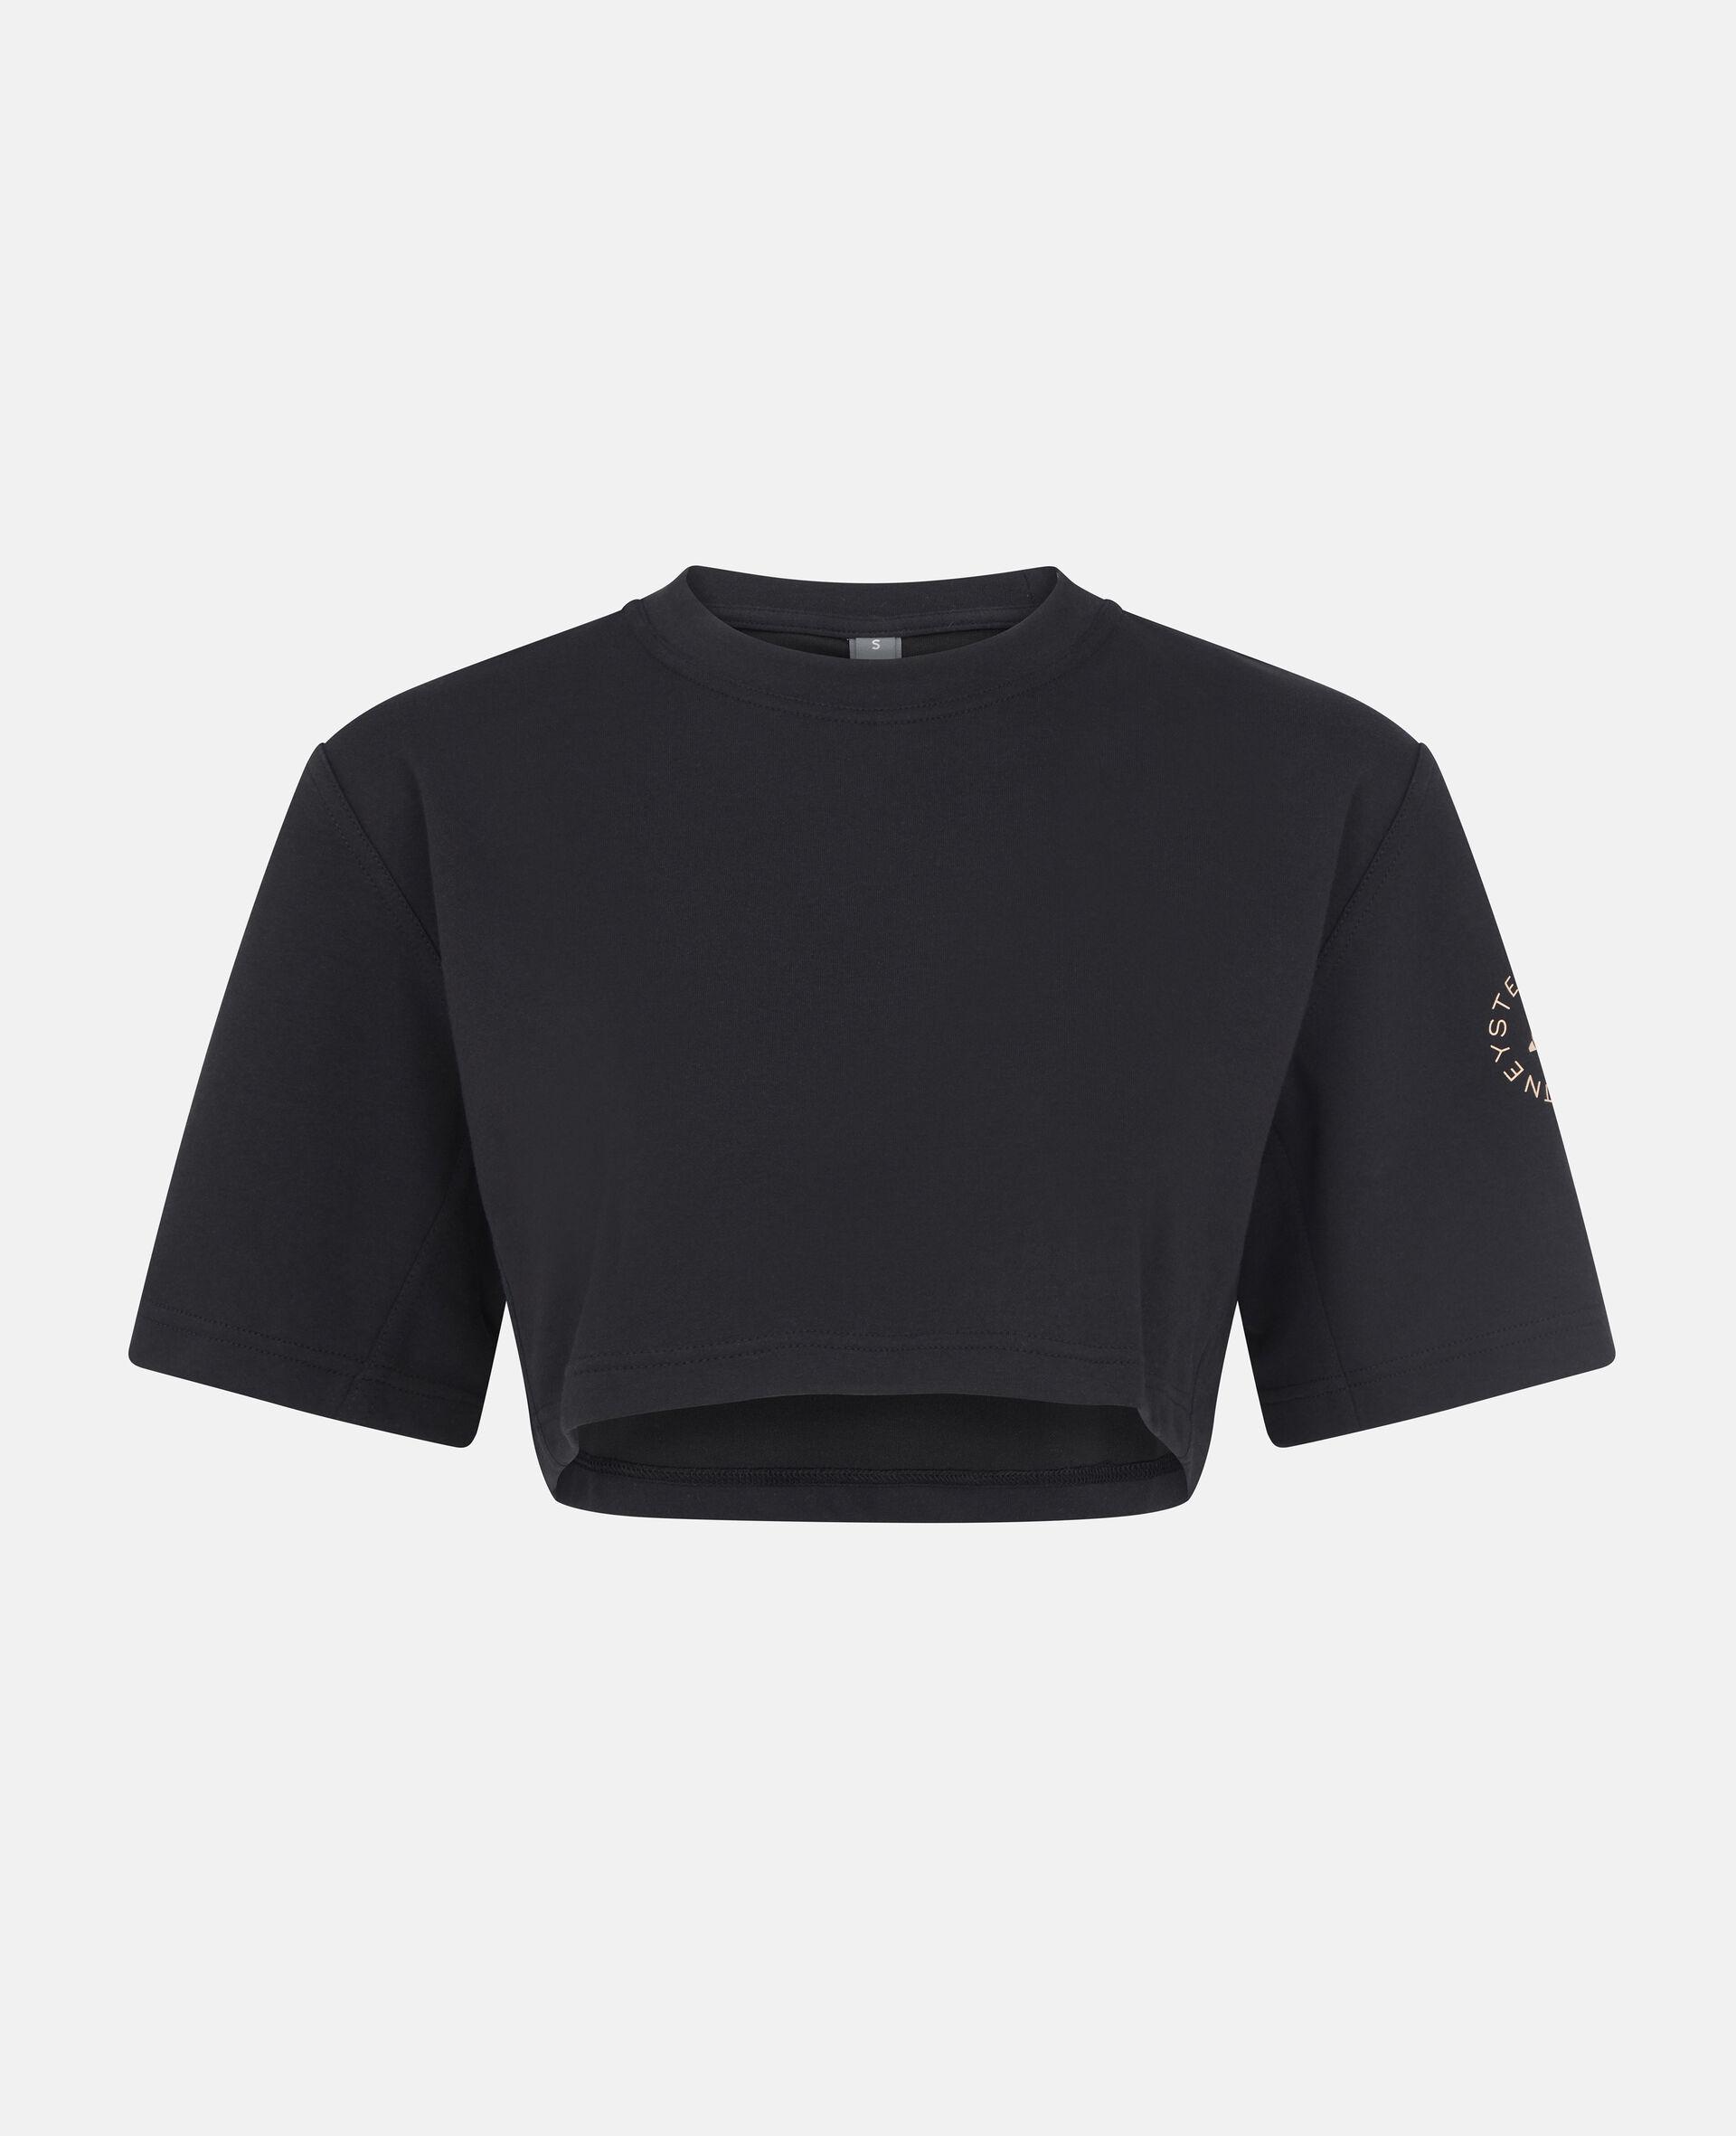 Kurzes schwarzes Sport-T-Shirt-Schwarz-large image number 0